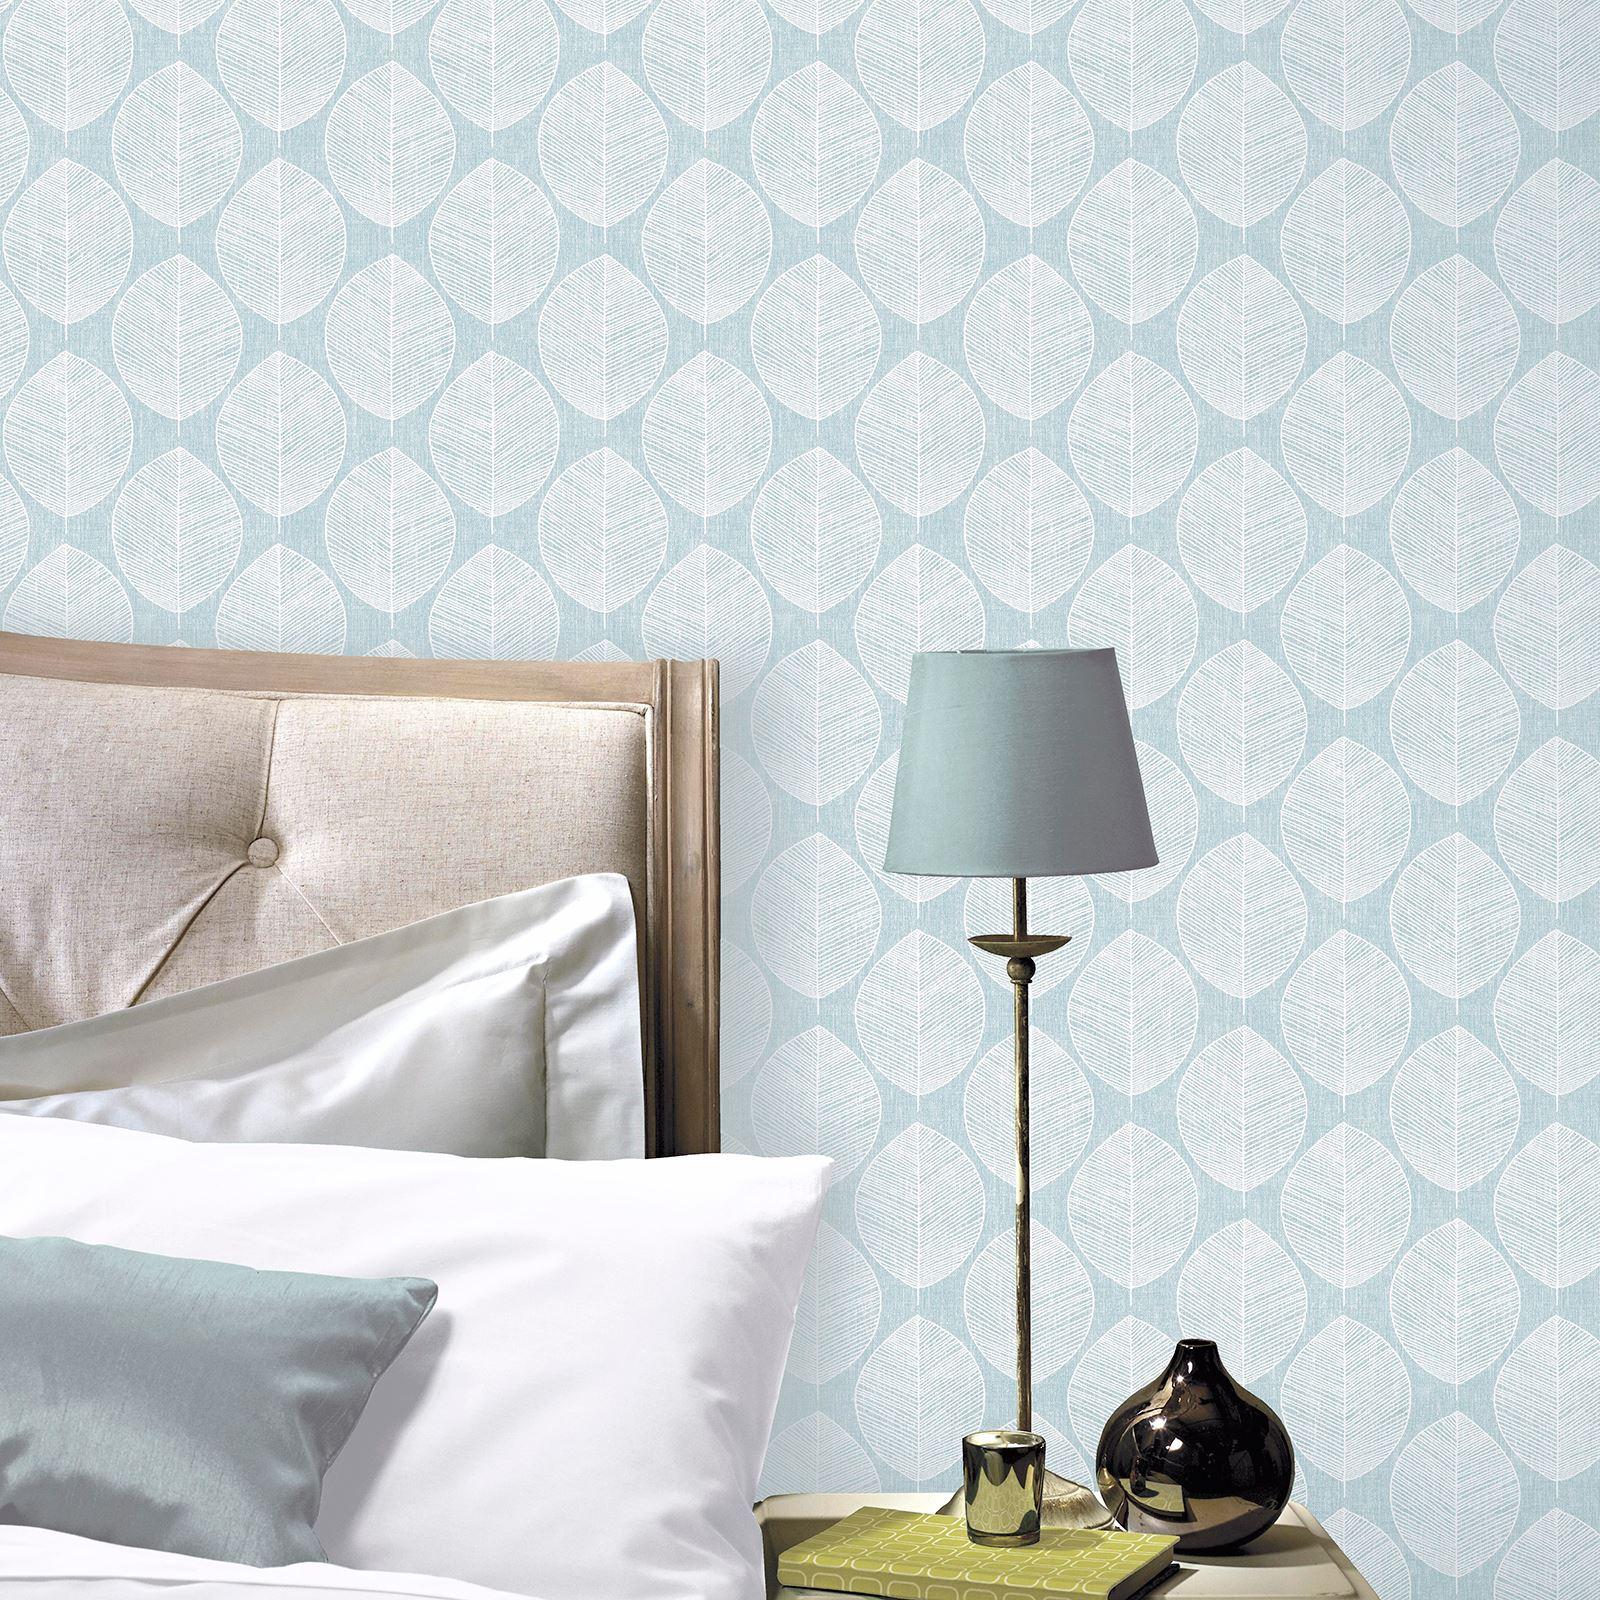 Indexbild 7 - Arthouse Scandi Blatt Tapete - Grau Rosa Blaugrün Schlafzimmer Flur Lounge